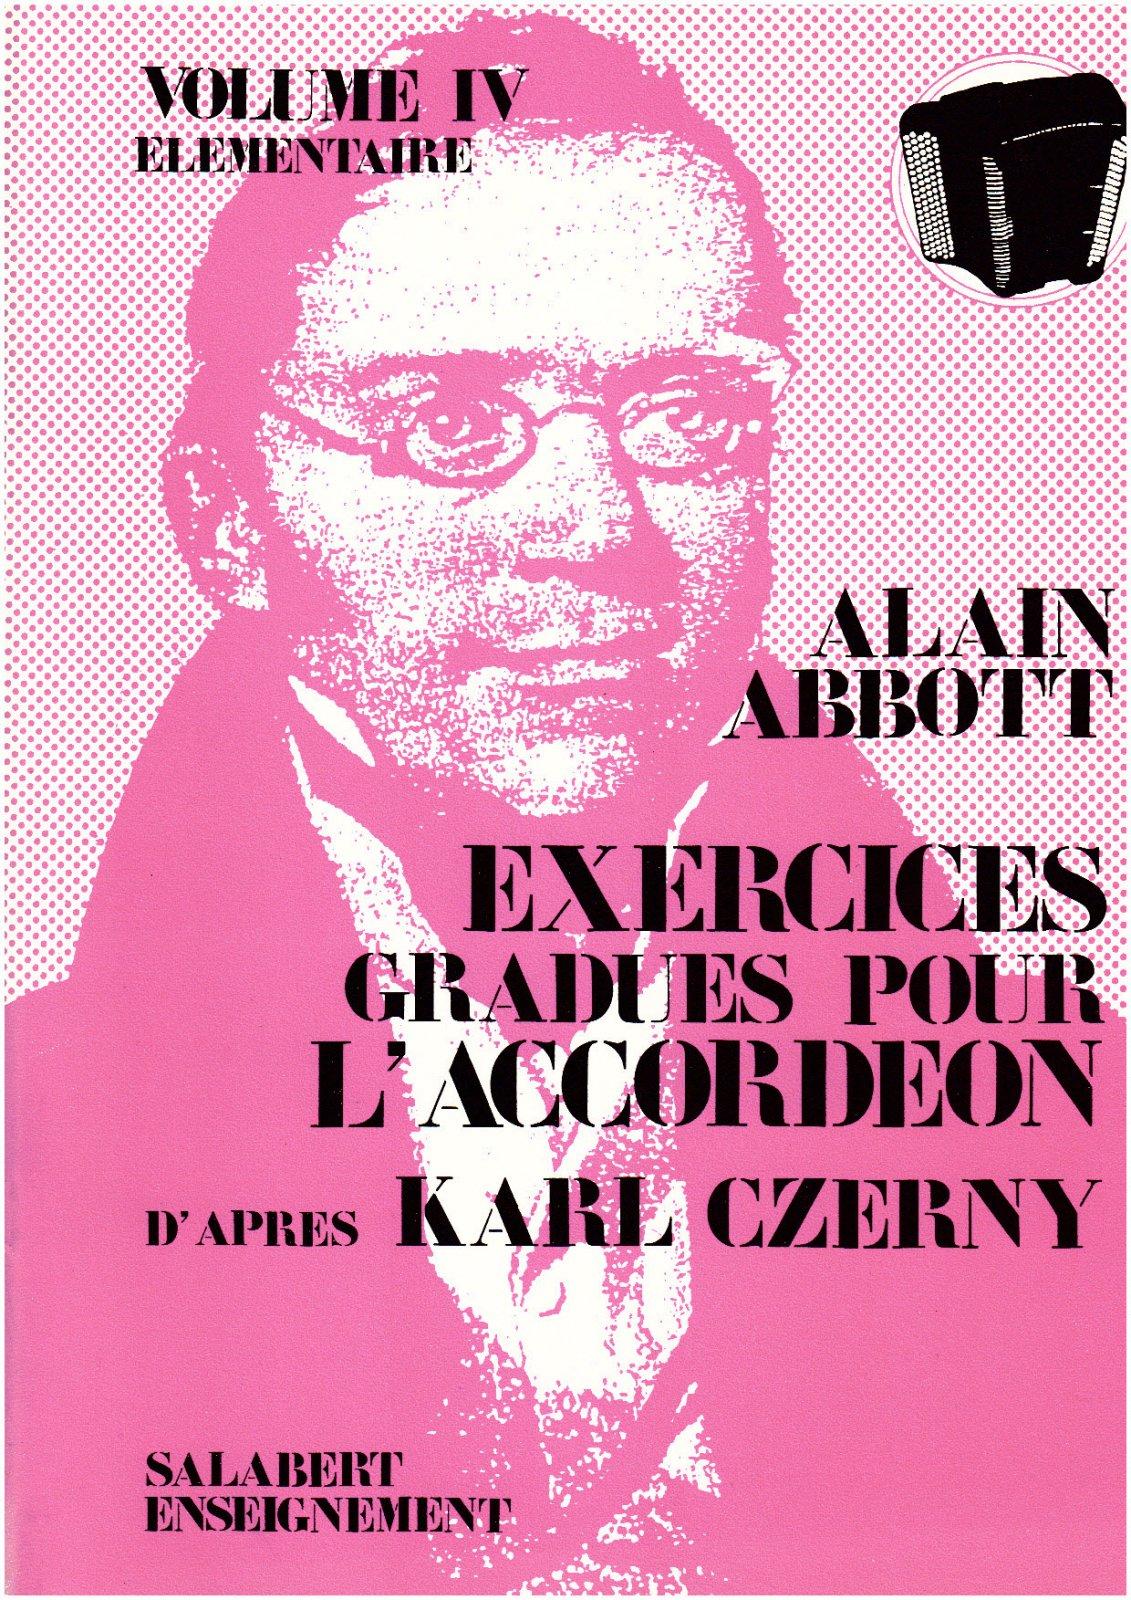 Abbott, Alain - Exercices Gradues Vol.4 Accordeon Enseignement